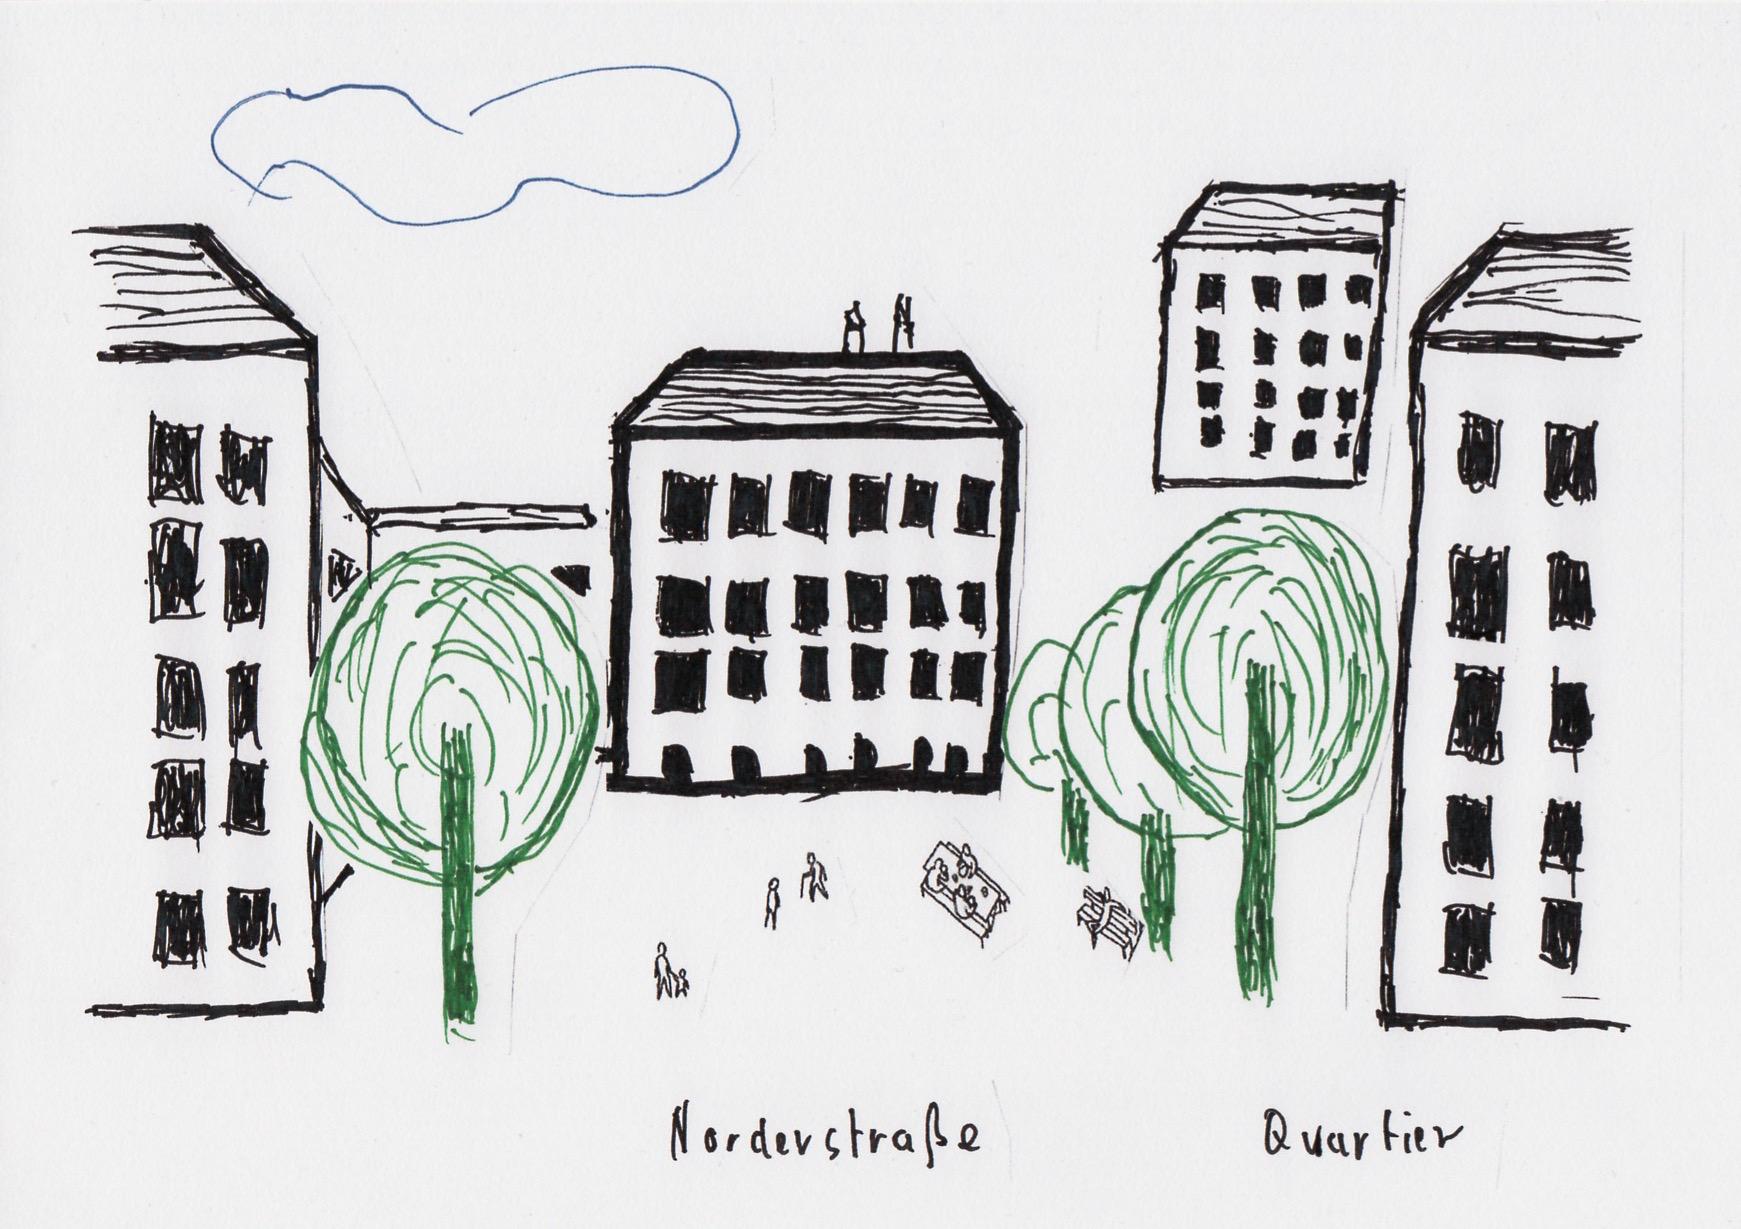 Skizze Norderstraße I 150 III Kopie